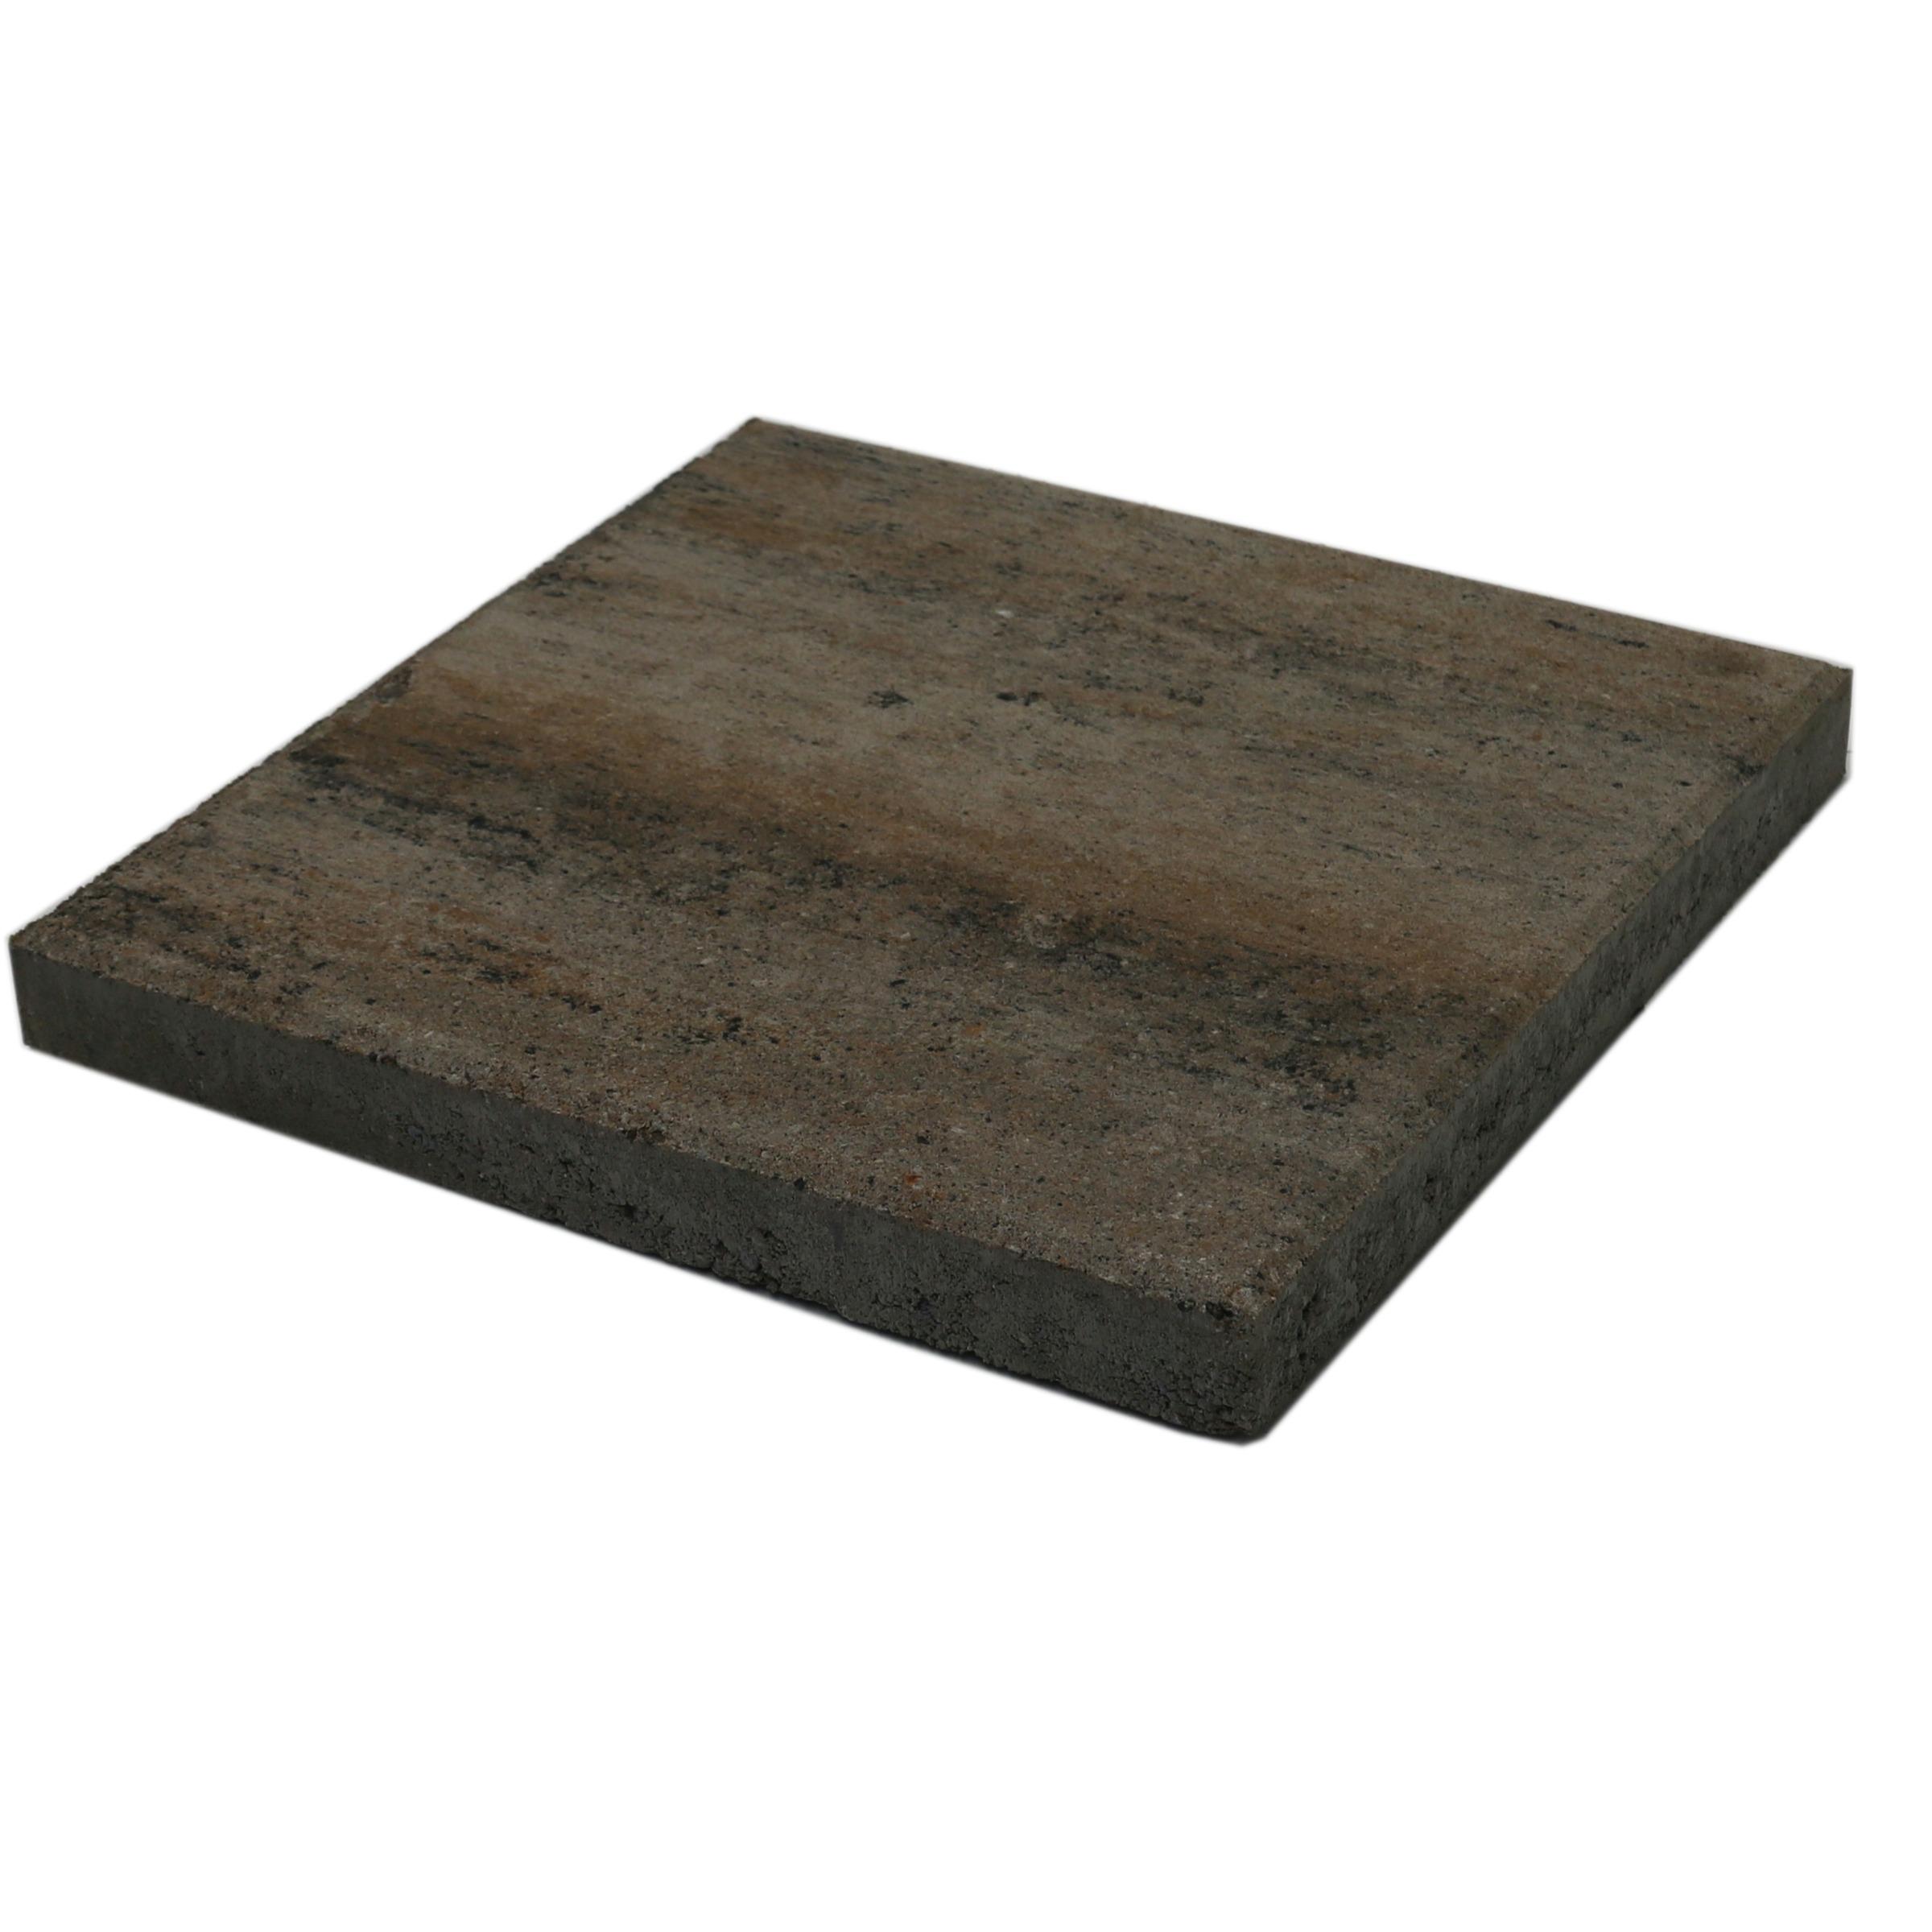 Terrastegel Beton Quadro Schelp Grijs/Bruin 40x40 cm - 108 Tegels - 17,28 m2